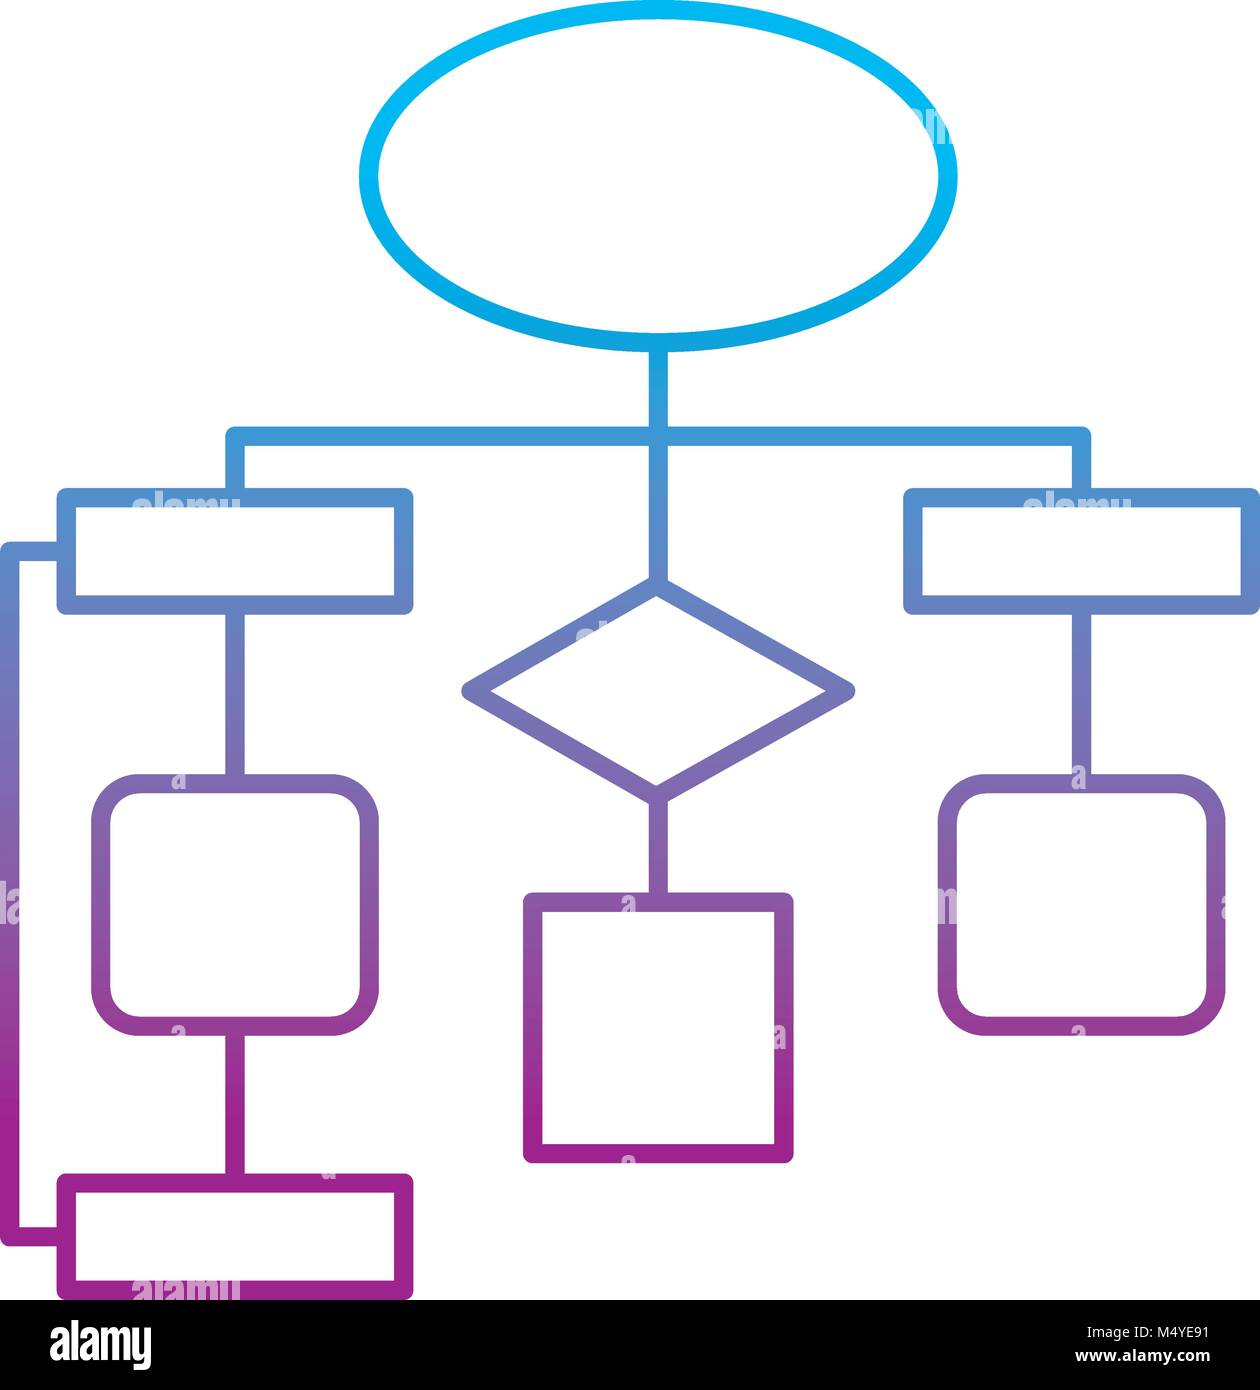 Business process flow chart stock photos business process flow diagram flow chart connection empty stock image nvjuhfo Gallery